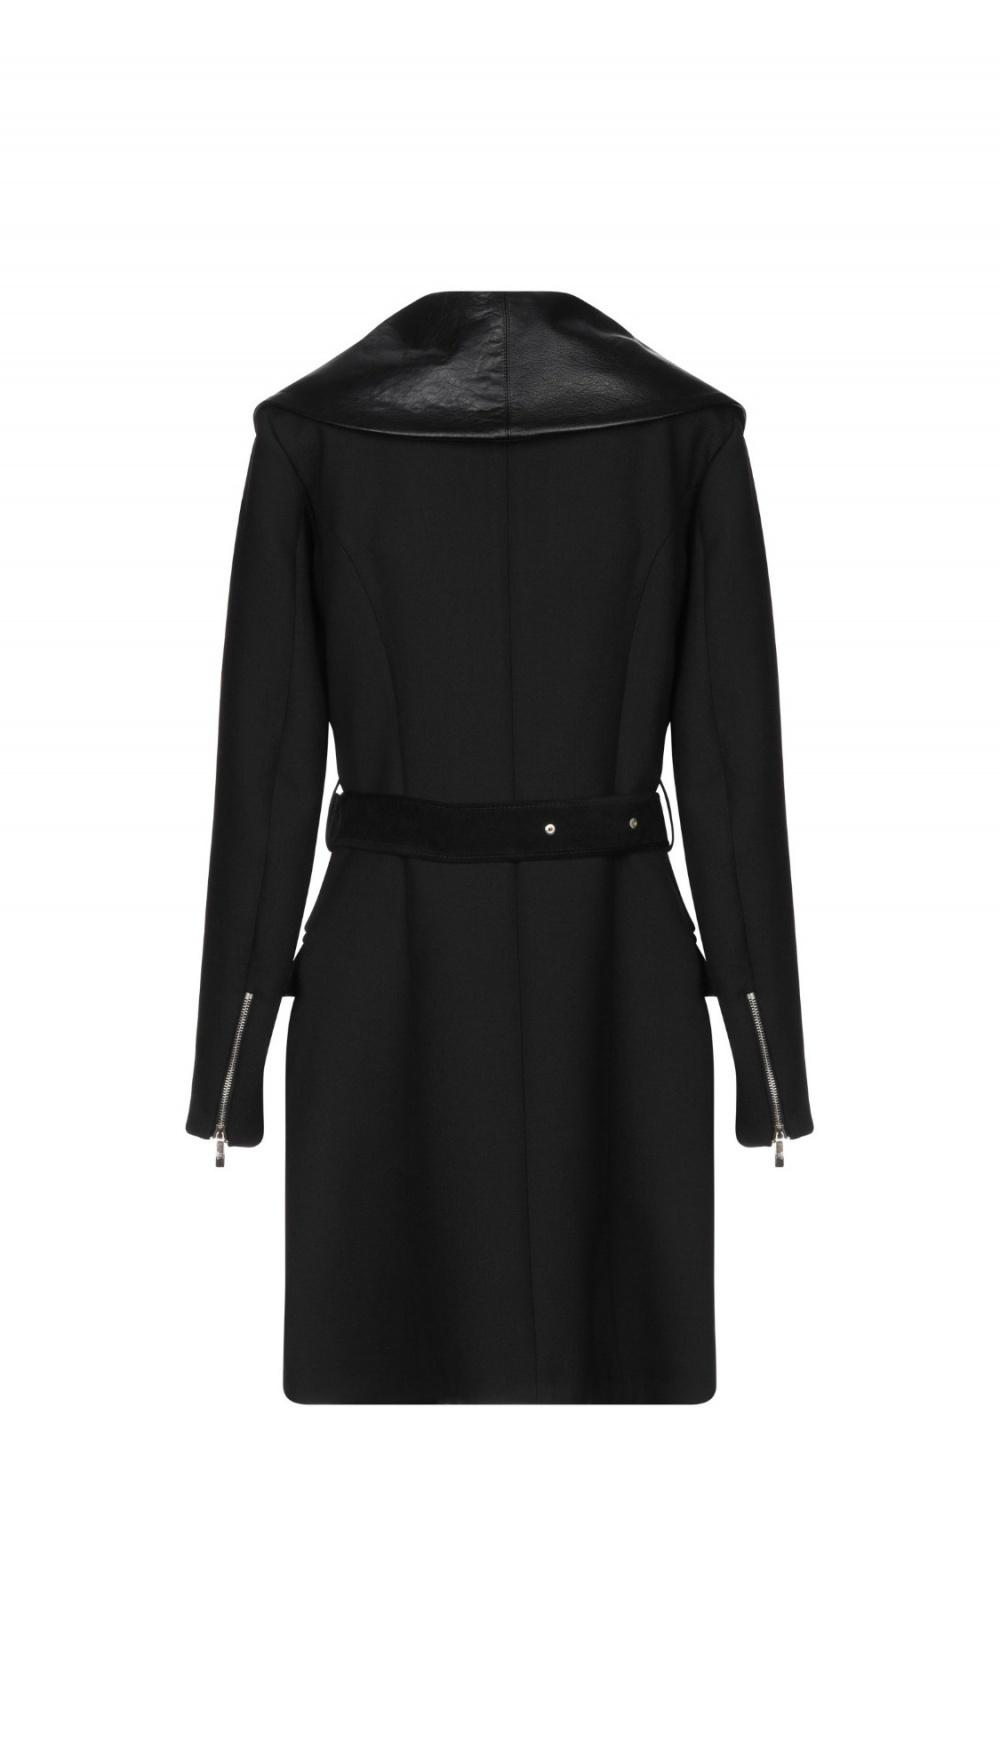 Легкое пальто(тренч) GIL SANTUCCI, на 46-48 размер